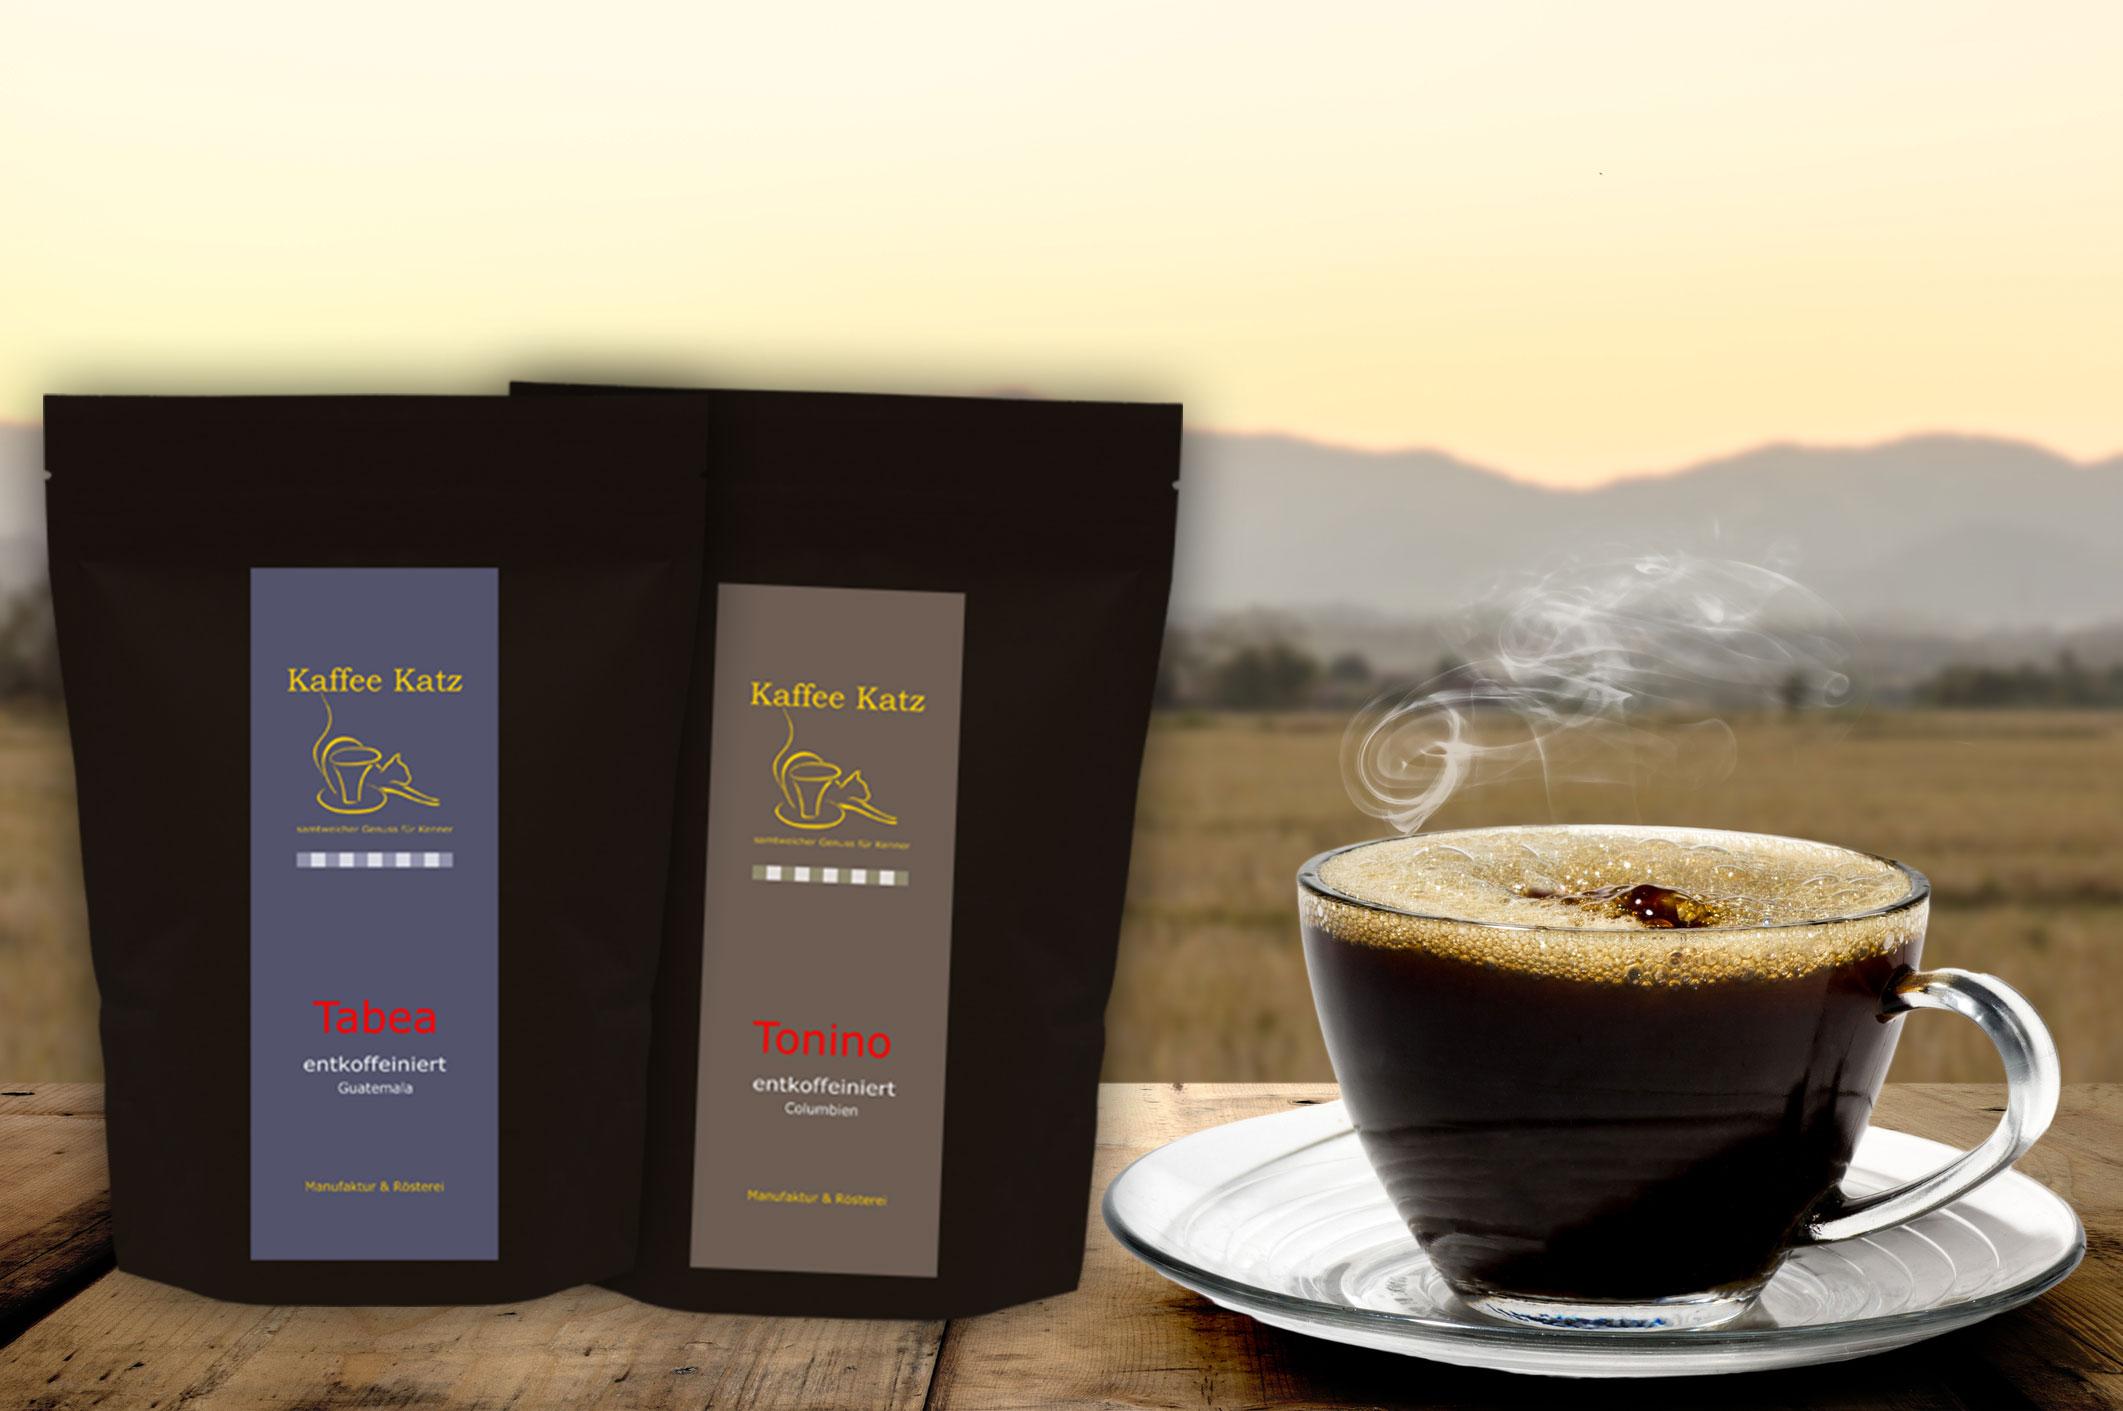 Geschenk Set 2 - entkoffeiniert Kaffee/Espresso